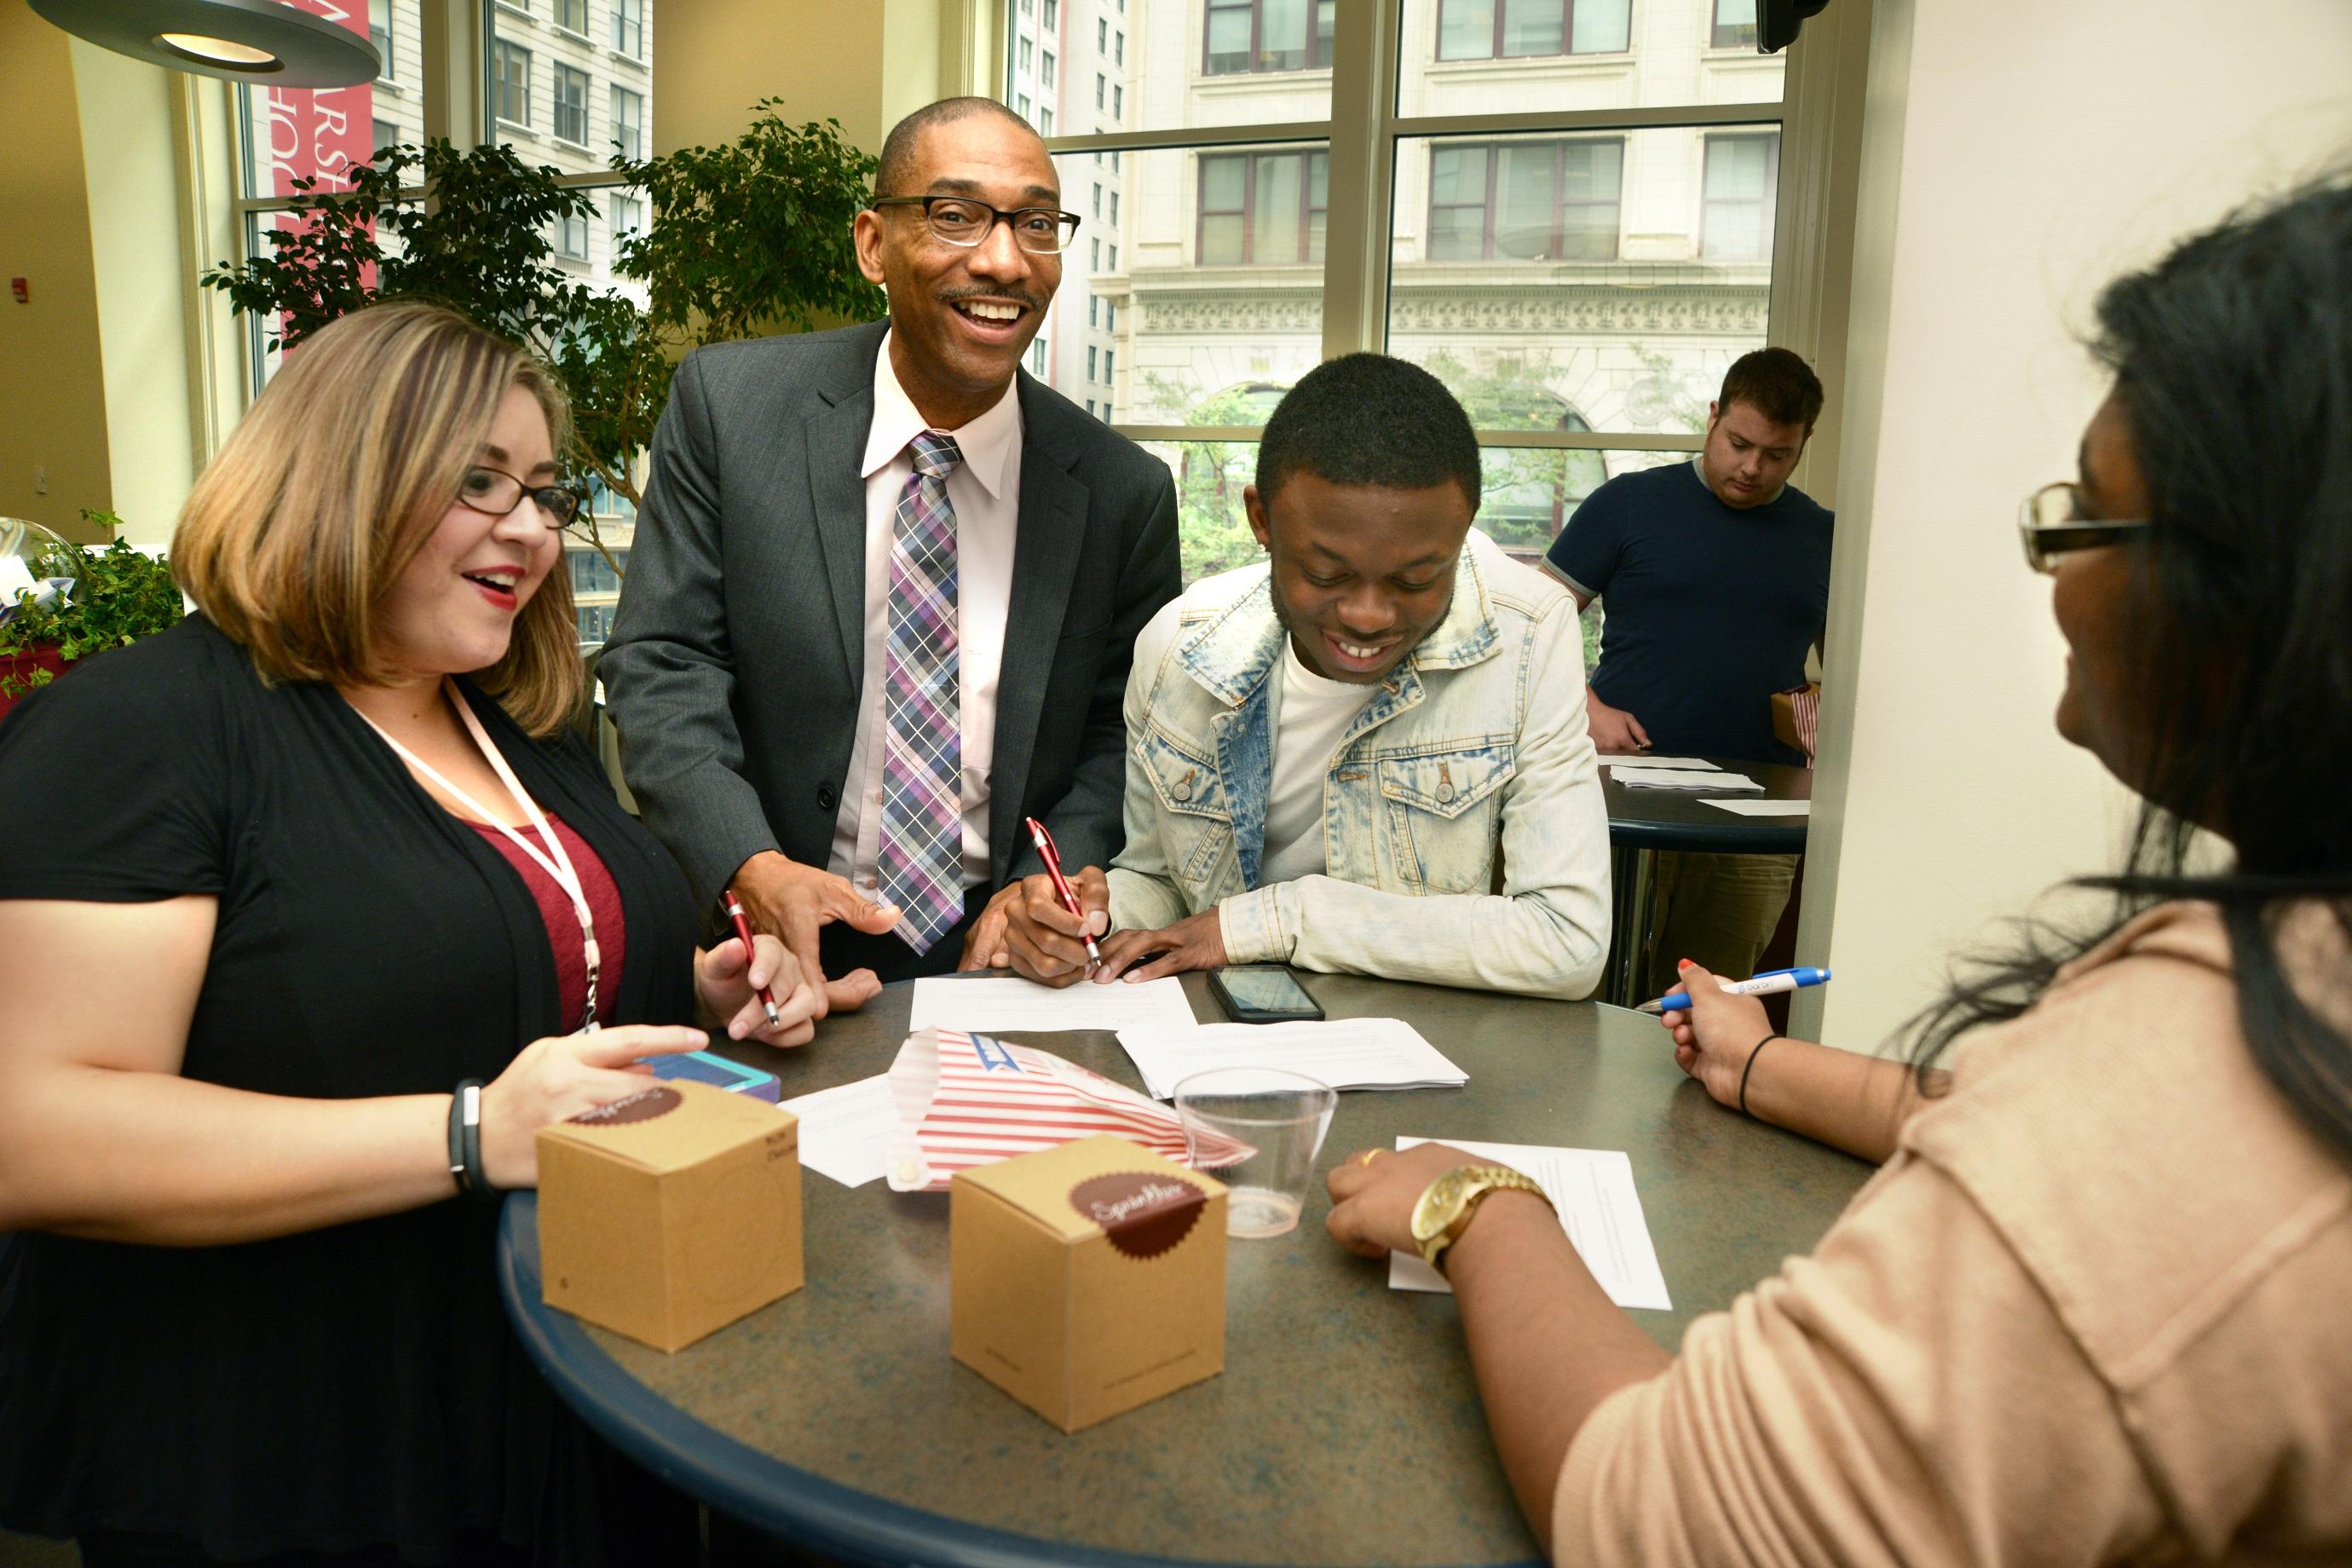 Law school diversity: John Marshall reports strong student